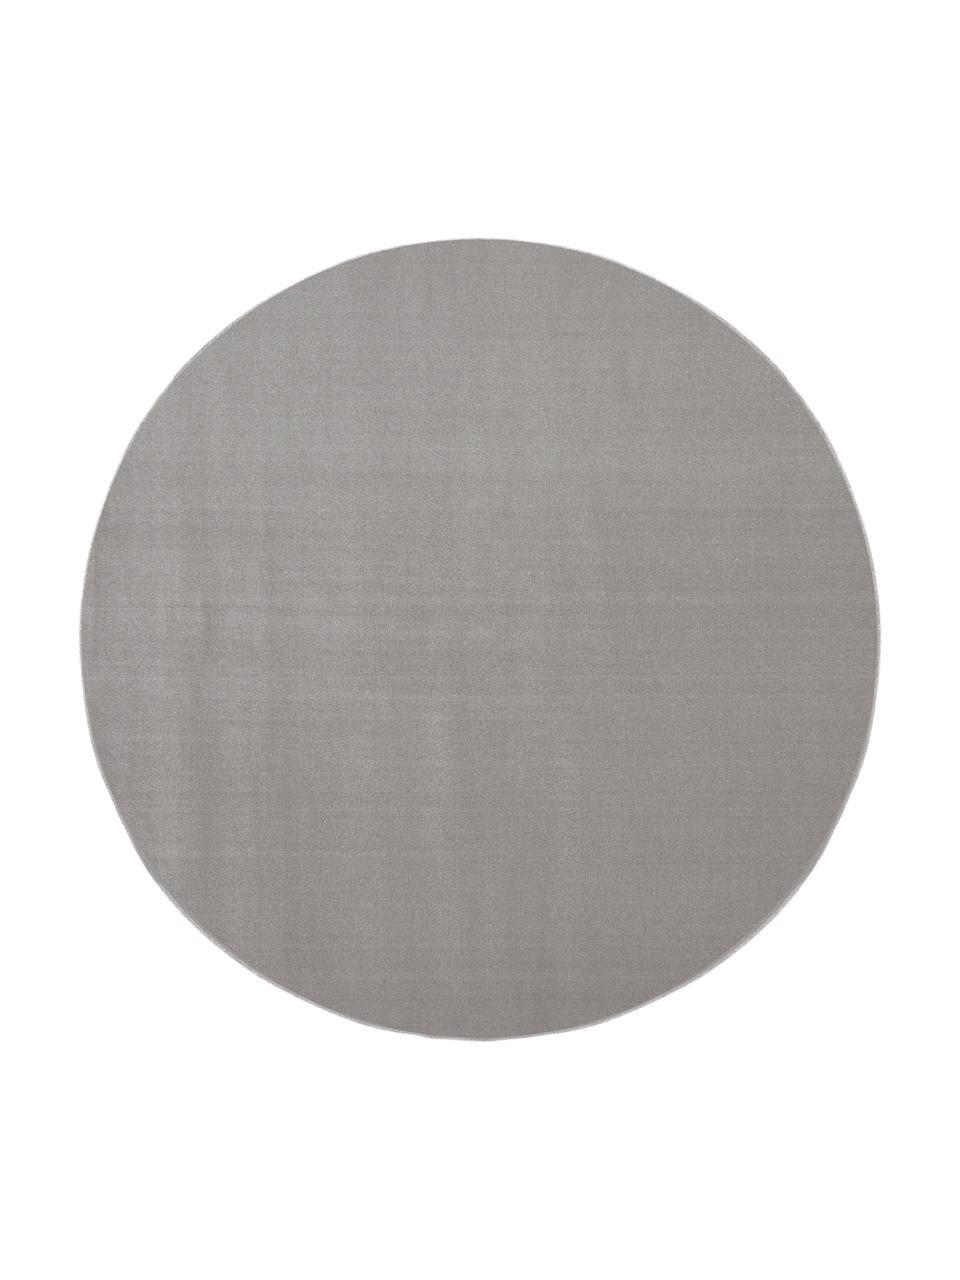 Runder Wollteppich Ida in Grau, Flor: 100% Wolle, Grau, Ø 200 cm (Größe L)